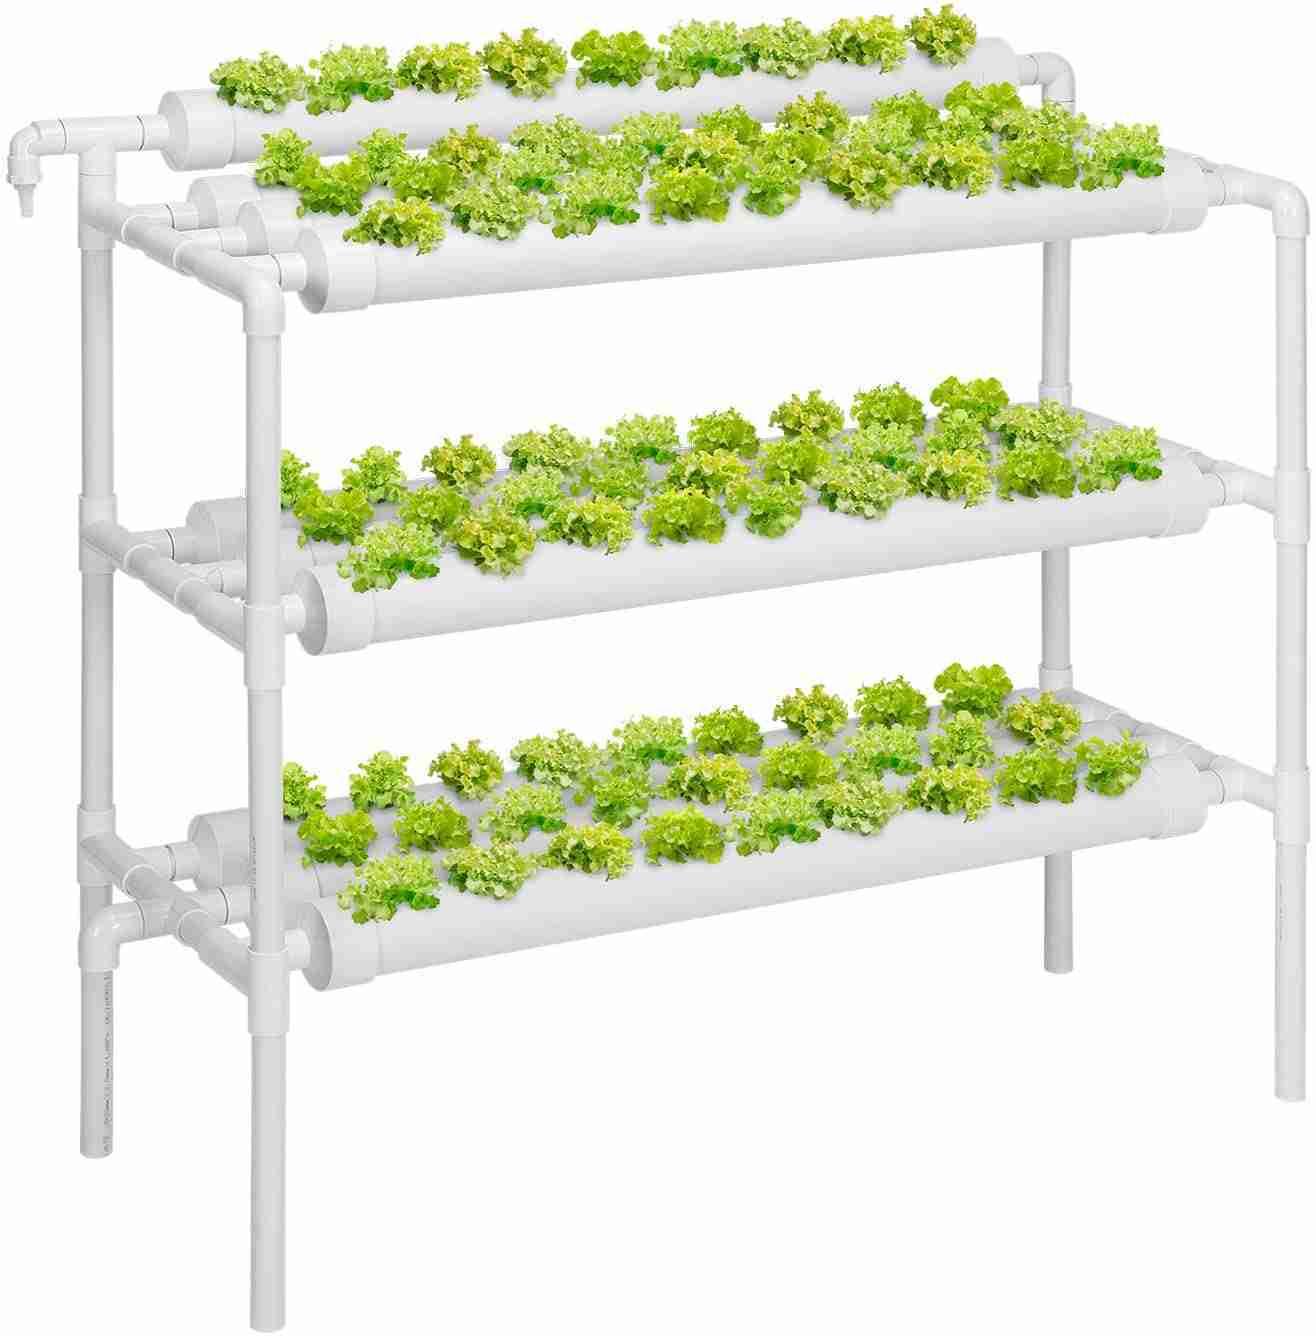 vivosun hydroponic grow kit isolated on white background